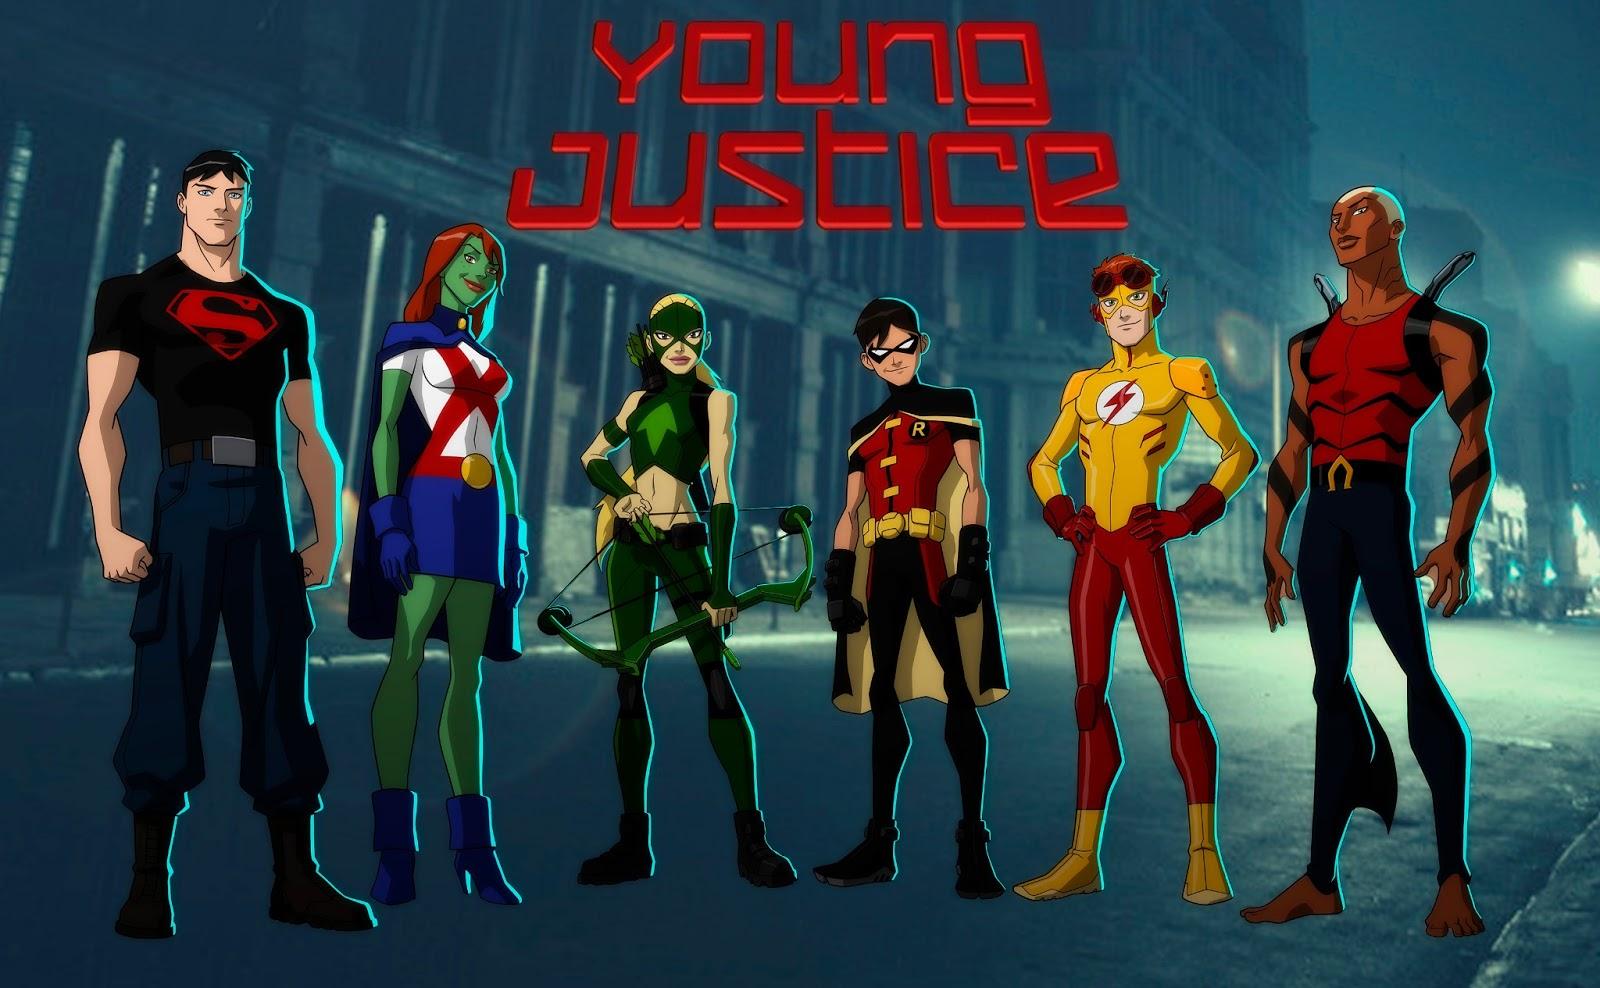 http://4.bp.blogspot.com/-KvYt2bqU6tY/UWDmDBIdwpI/AAAAAAAADcc/j2H0niBYXyw/s1600/Young-Justice-The-Team-young-justice-32430981-3328-2056.jpg